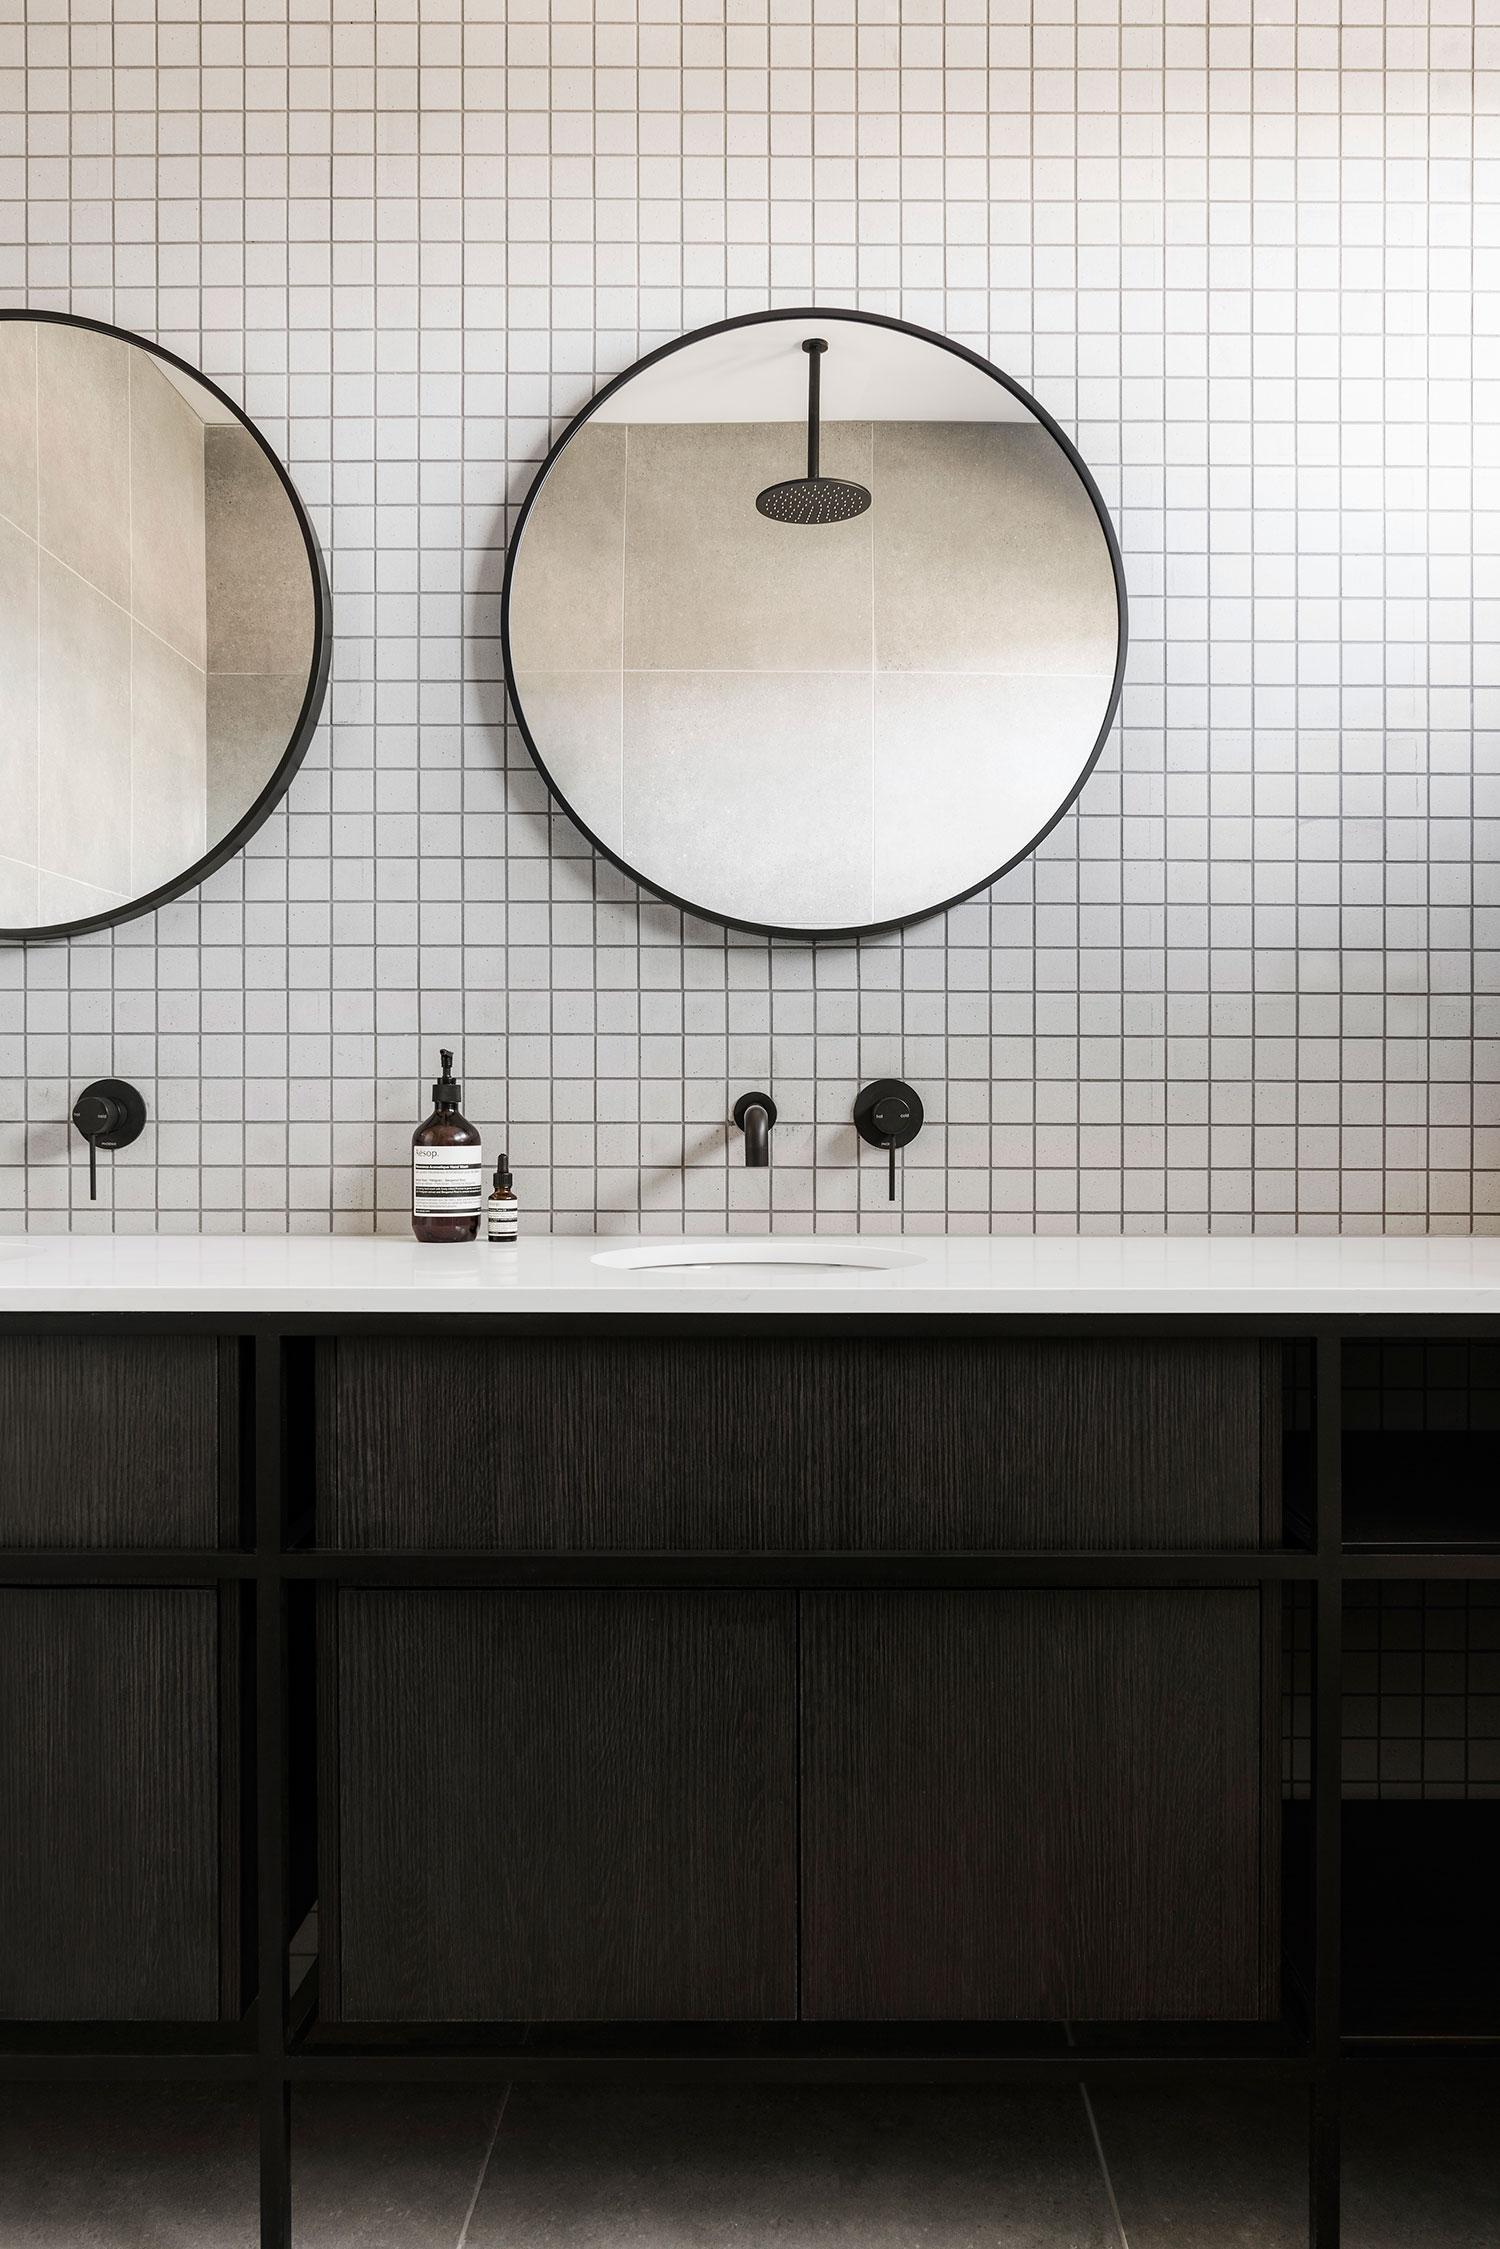 osborne-townhouse-interior-design-bathroom-vanity-close-up-ckariouz-architects3